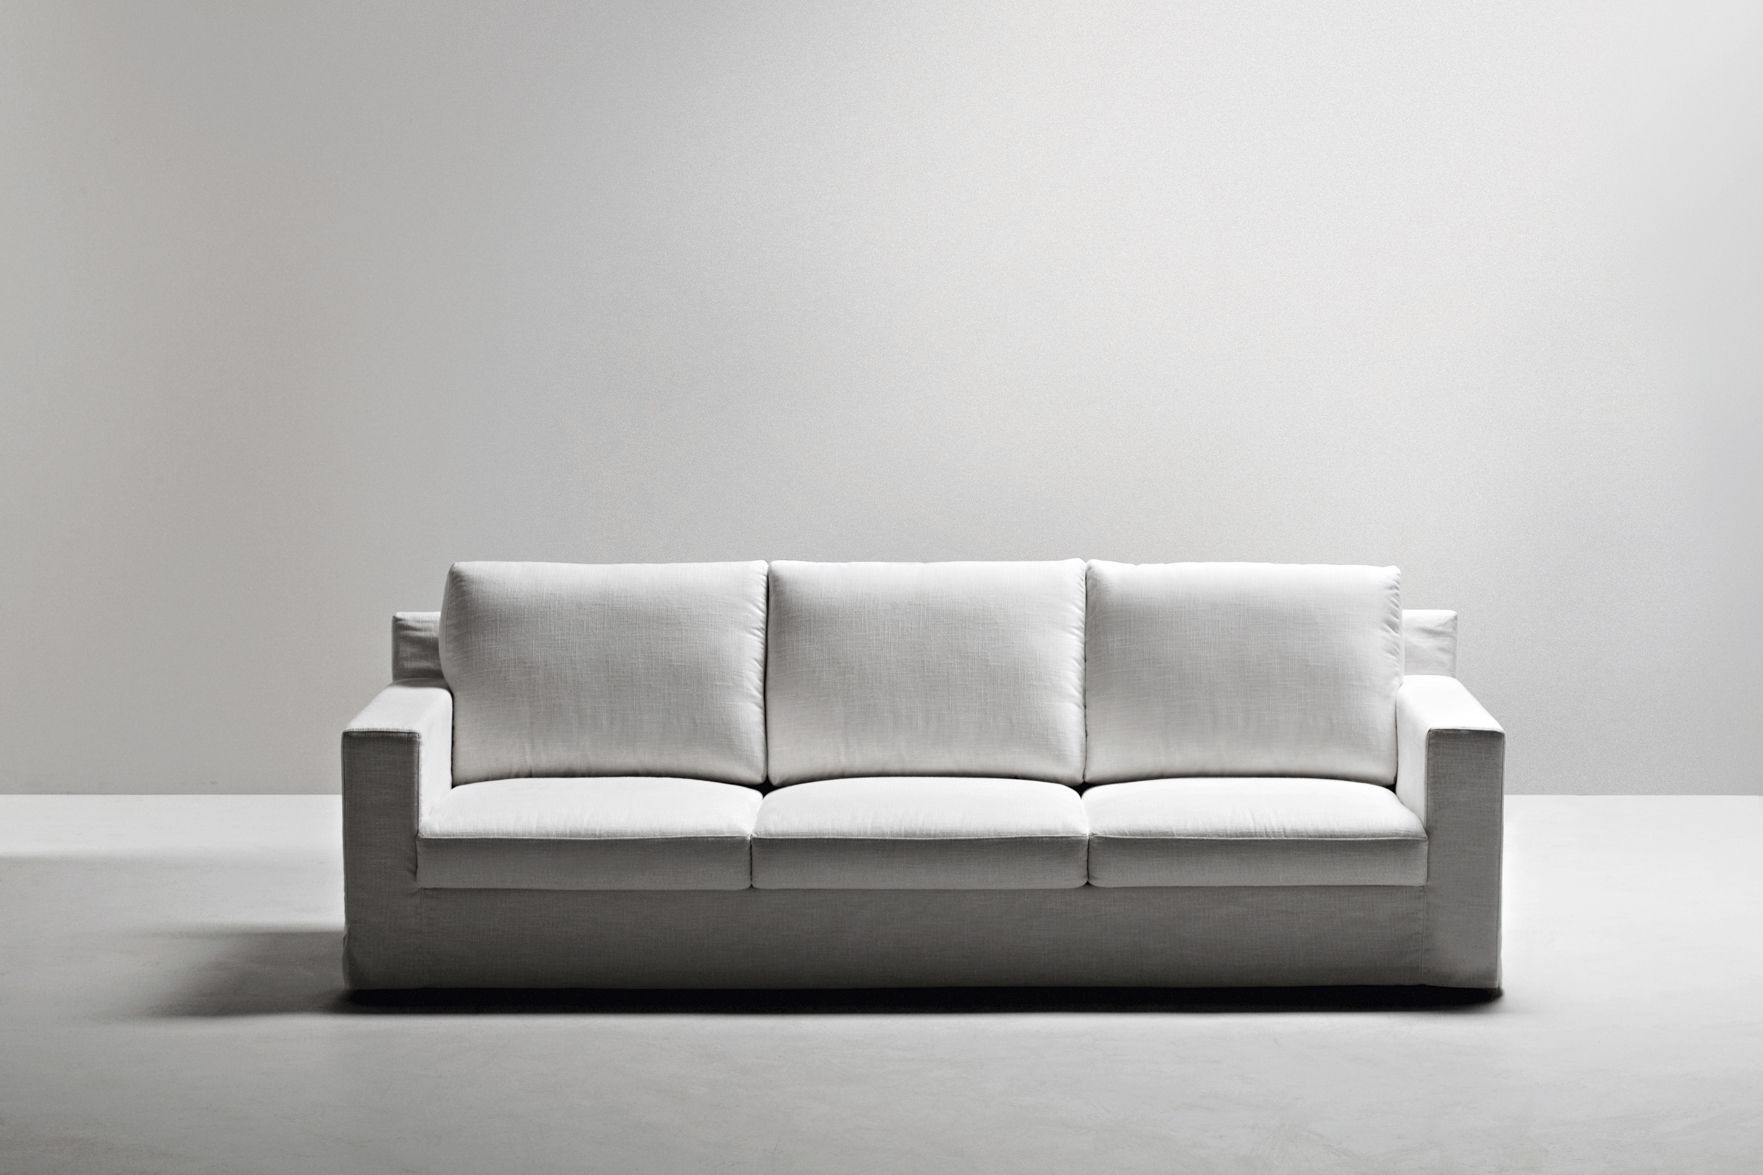 Modular sofa contemporary leather fabric MANHATTAN by LC